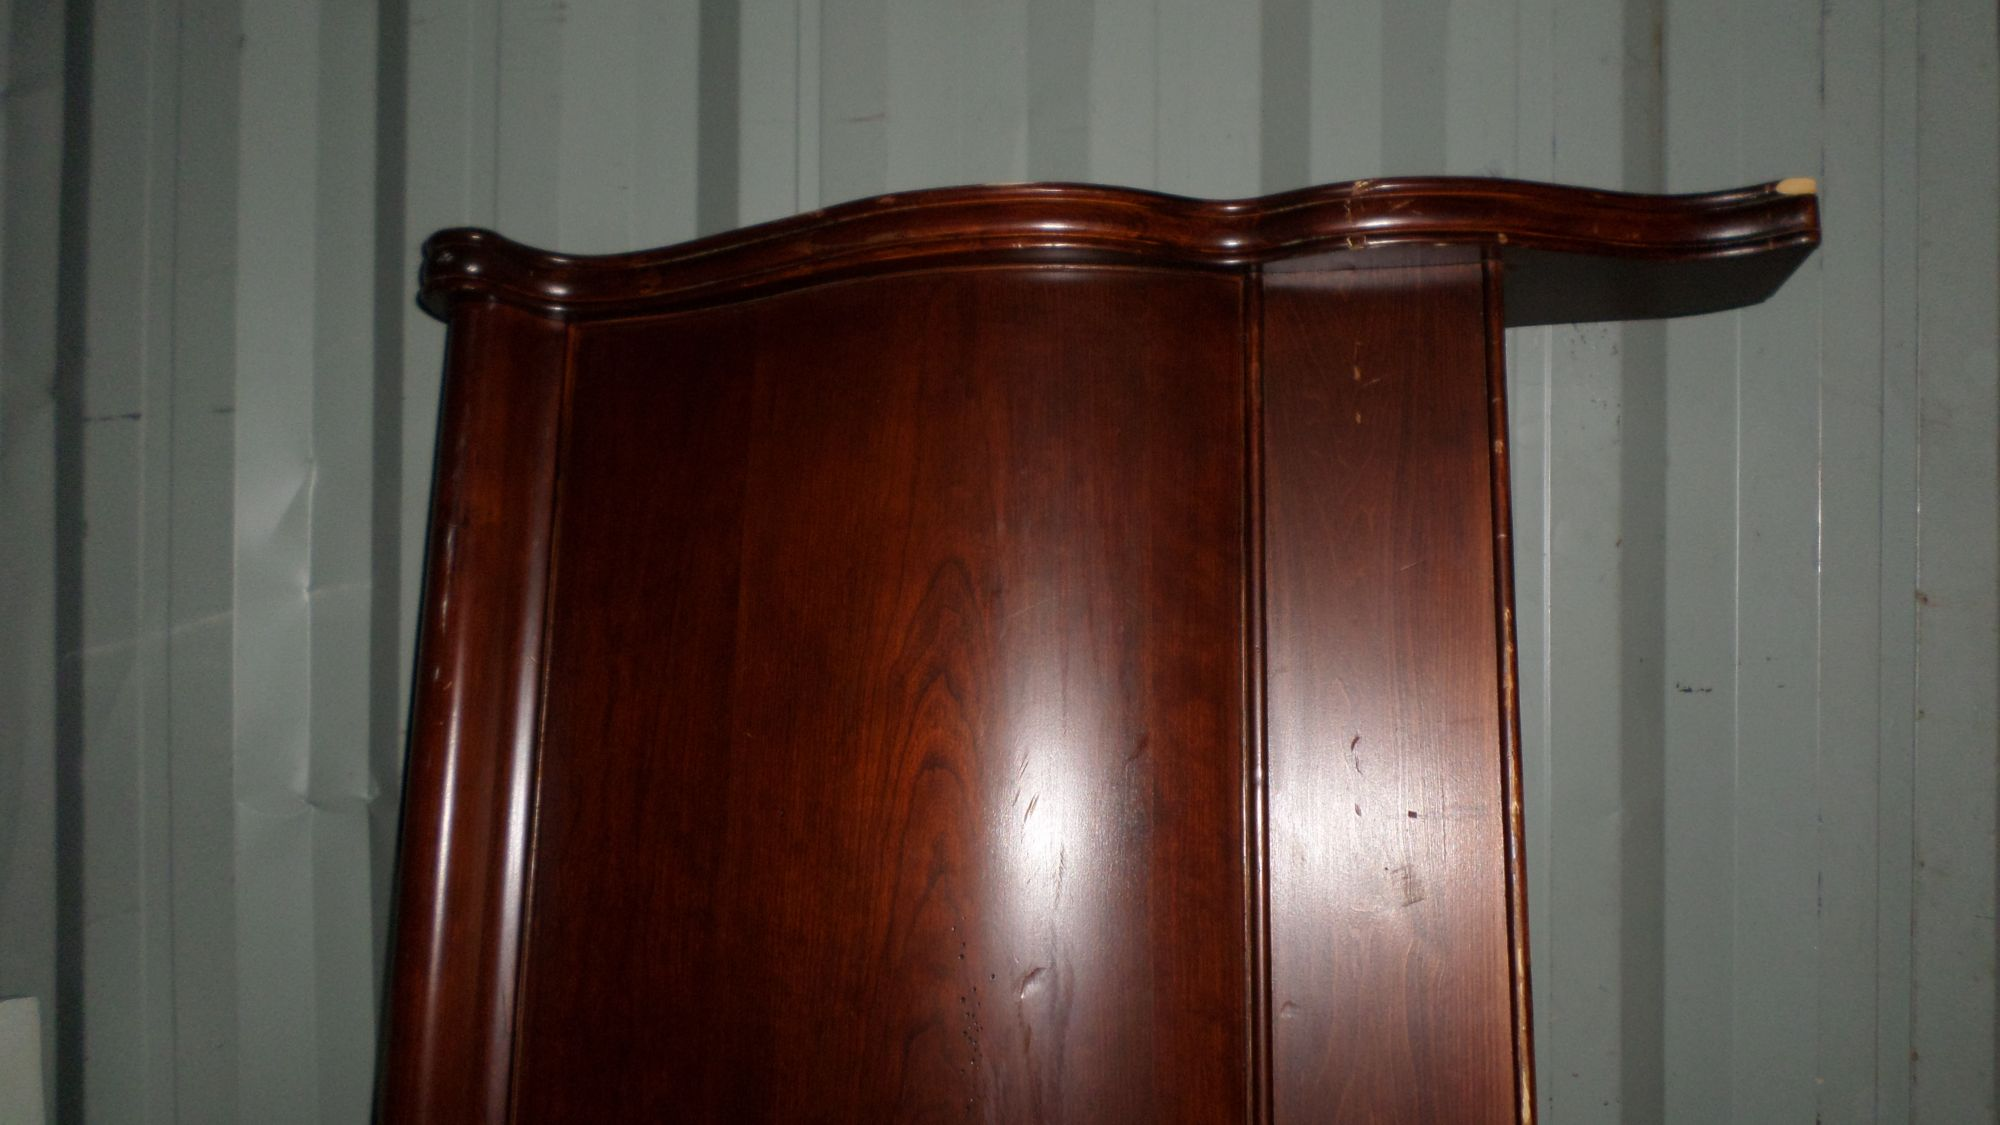 CLICK THUMBNAIL TO VIEW. Kinston NC & Storage Unit Auction: 531085 | Kinston NC | StorageTreasures.com